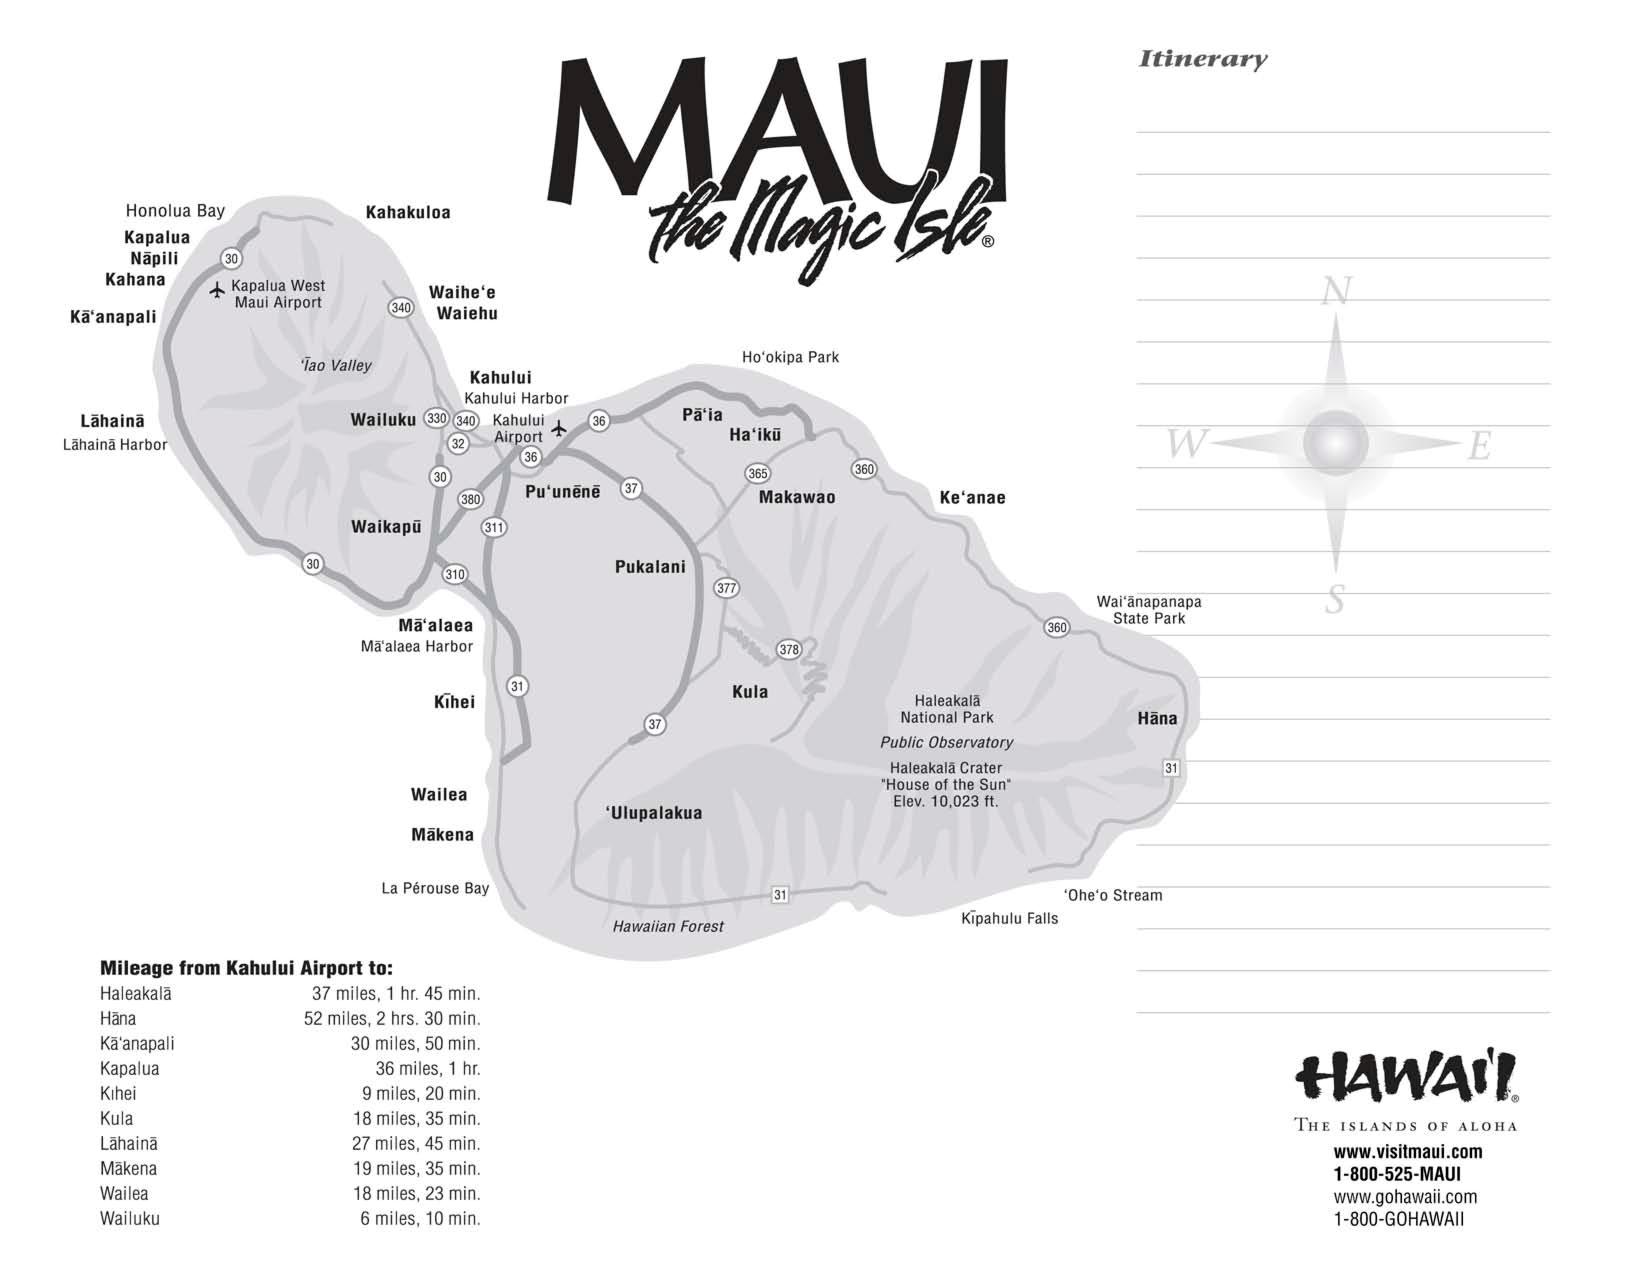 Maui maps printable printable maui hiking maps best maui hikes maui maps printable printable maui hiking maps best maui hikes best maui hikes hawaii pinterest hawaii trail maps and maui hawaii thecheapjerseys Image collections